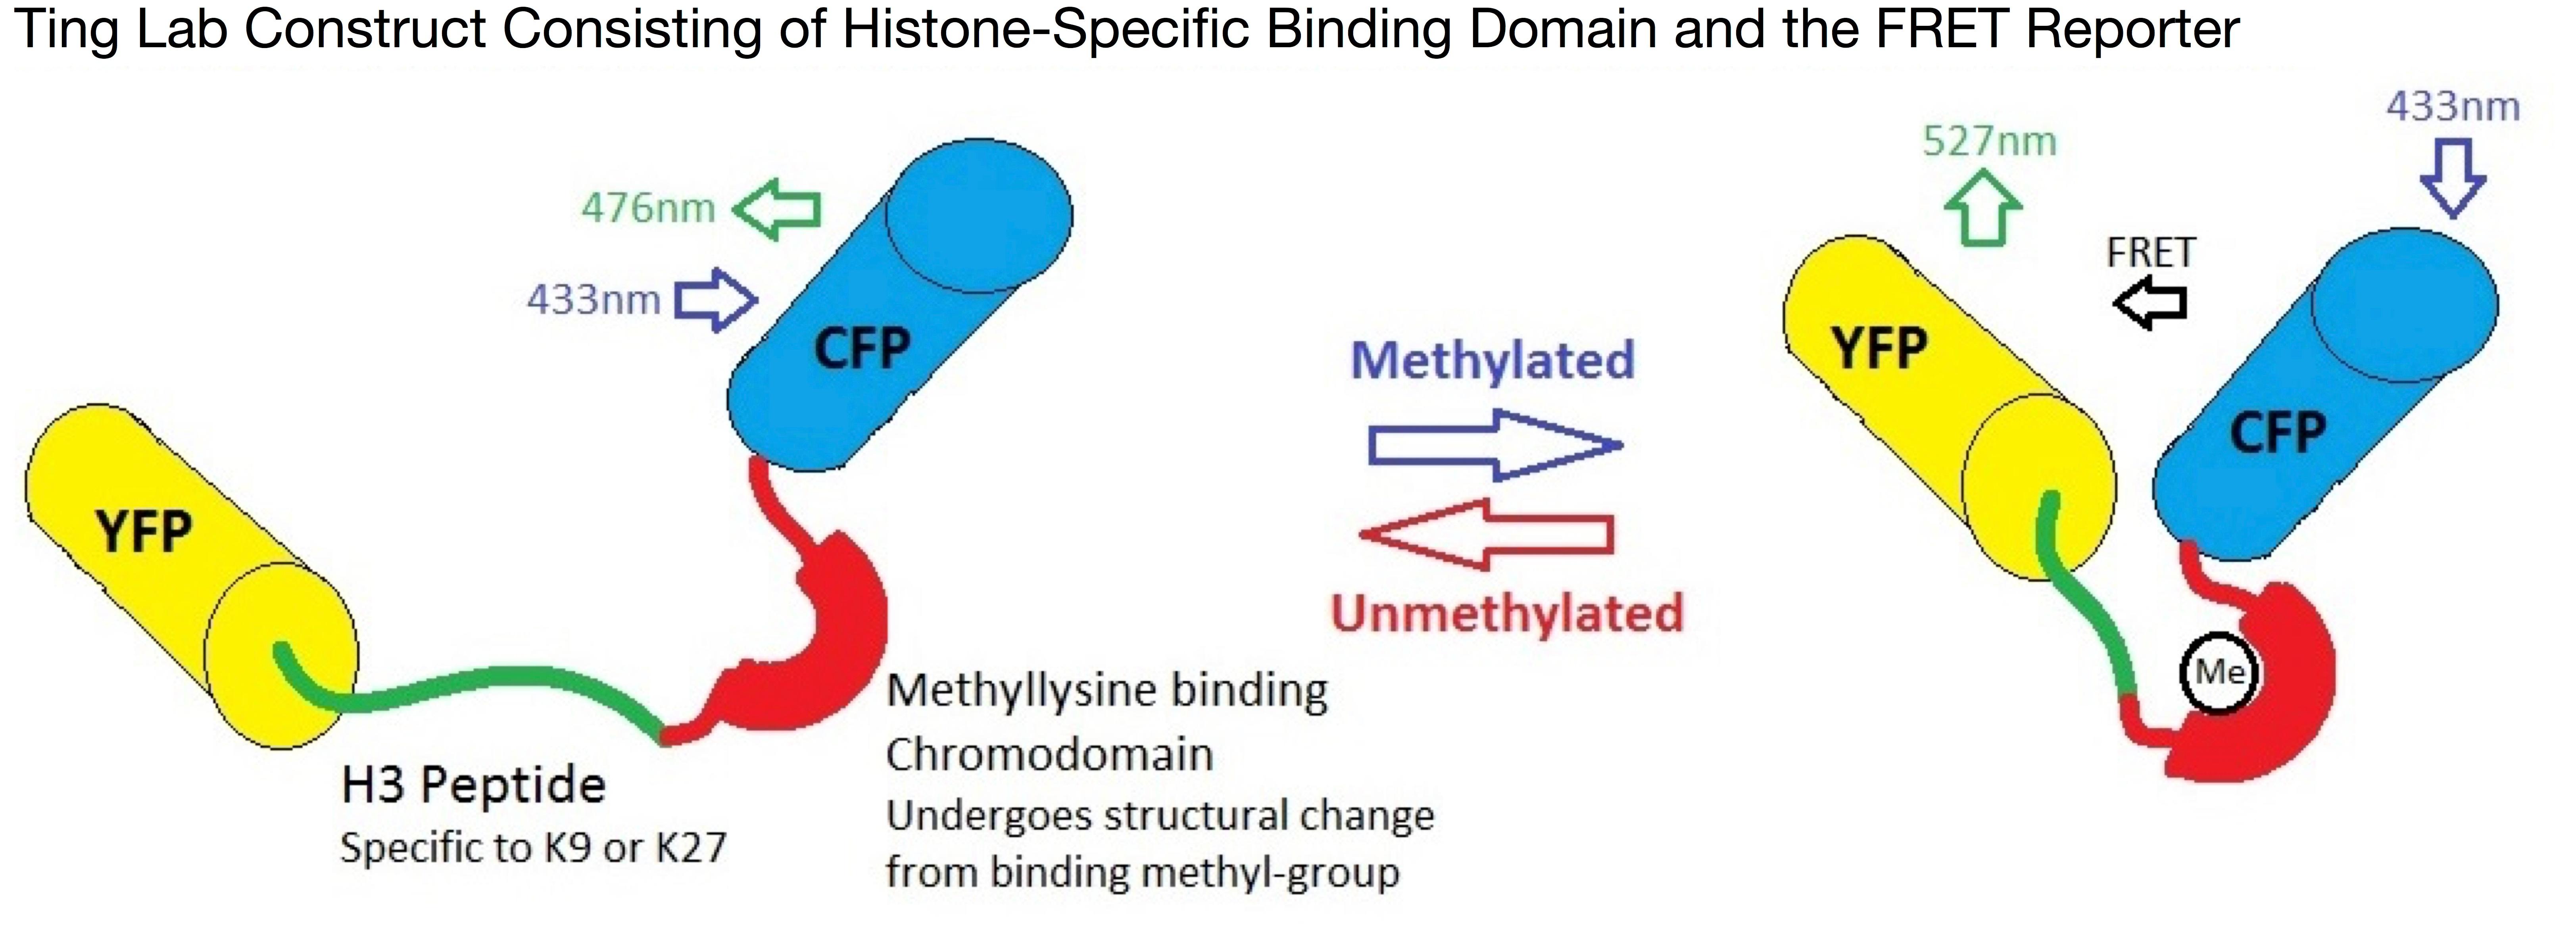 Ting lab FRET based biosensor for histone modifications